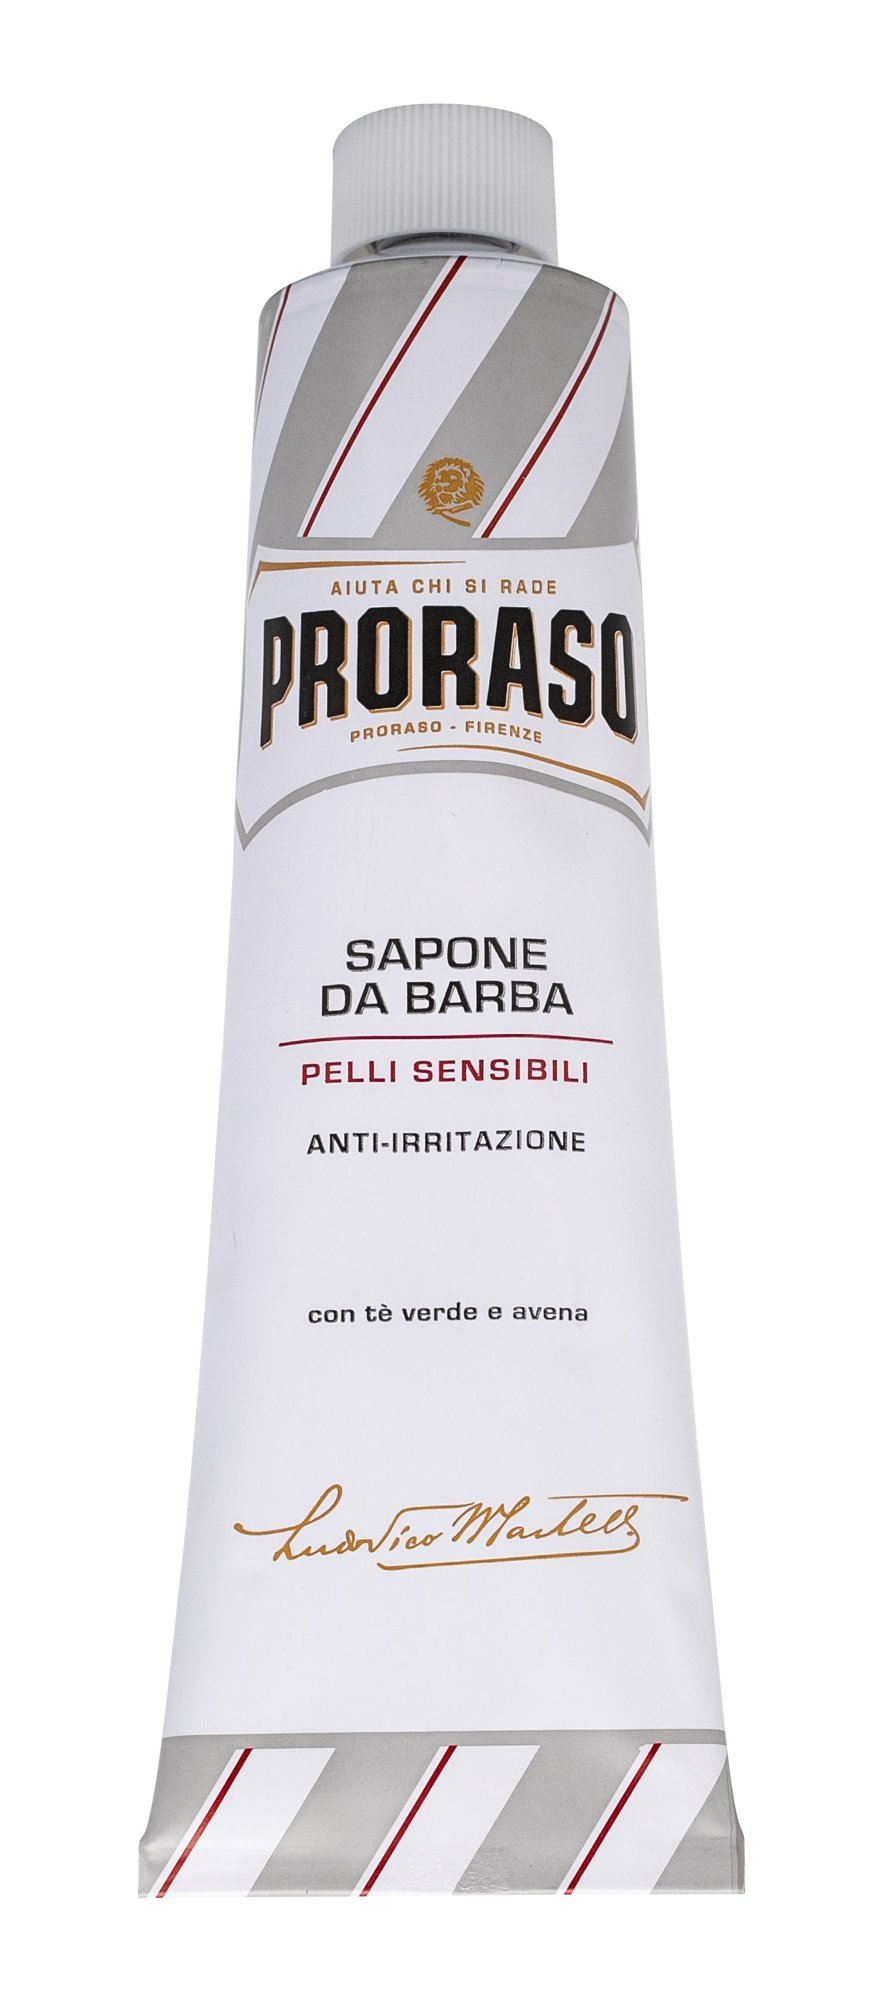 PRORASO White Shaving Foam 150ml